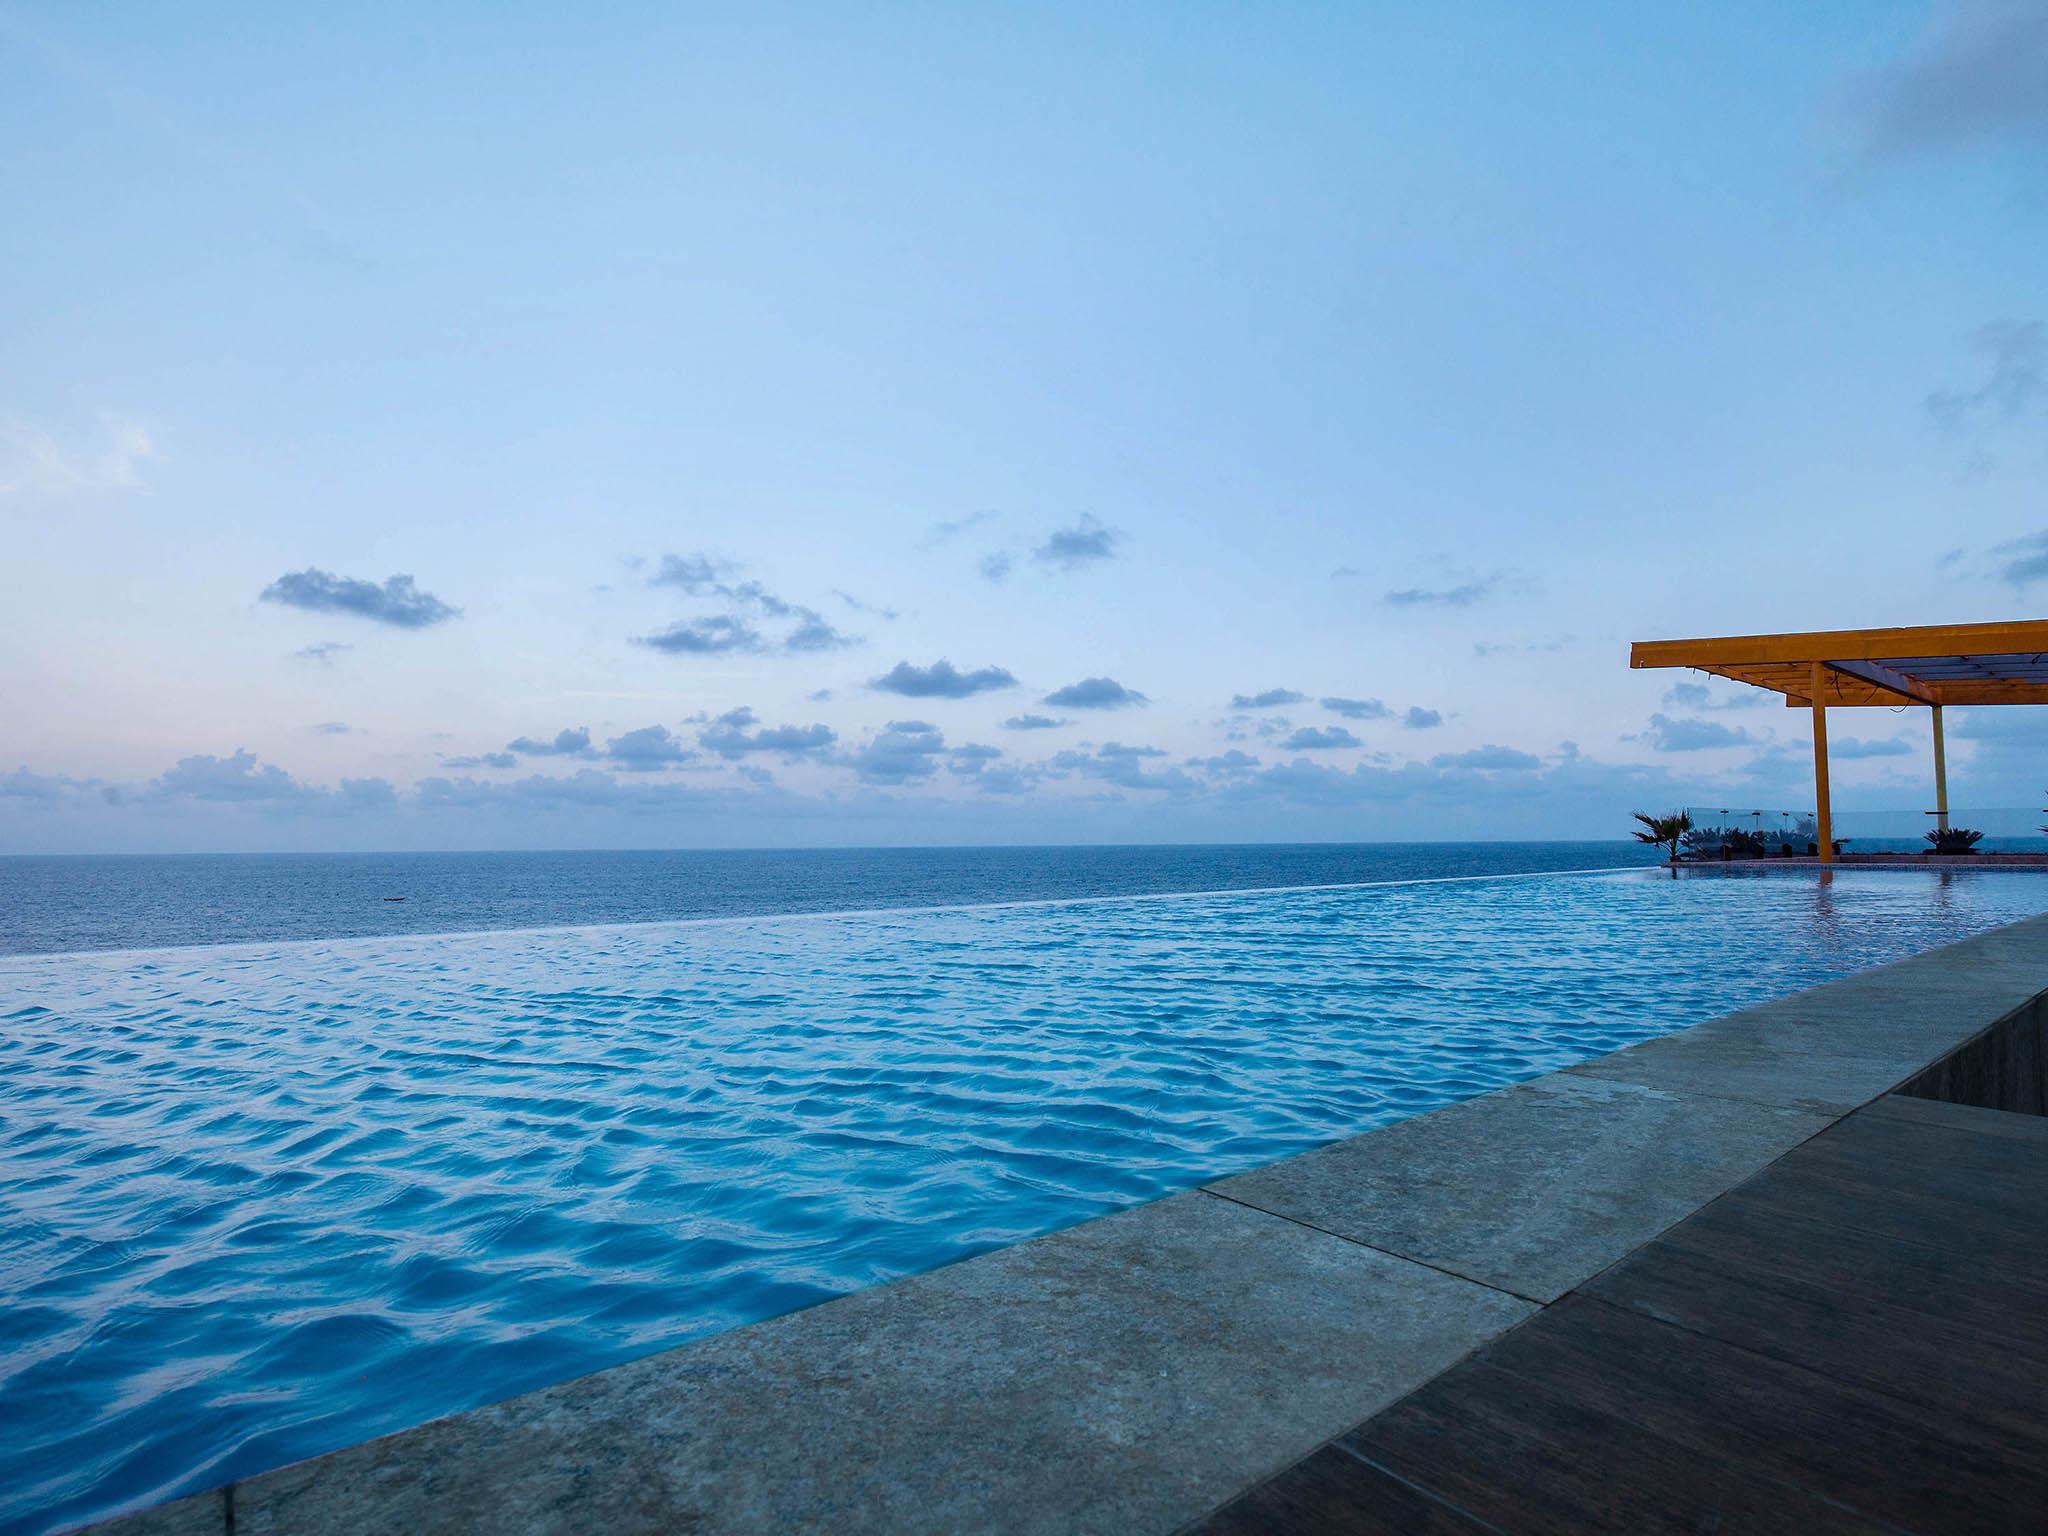 Hotel – The Bheemli Resort - Managed by AccorHotels